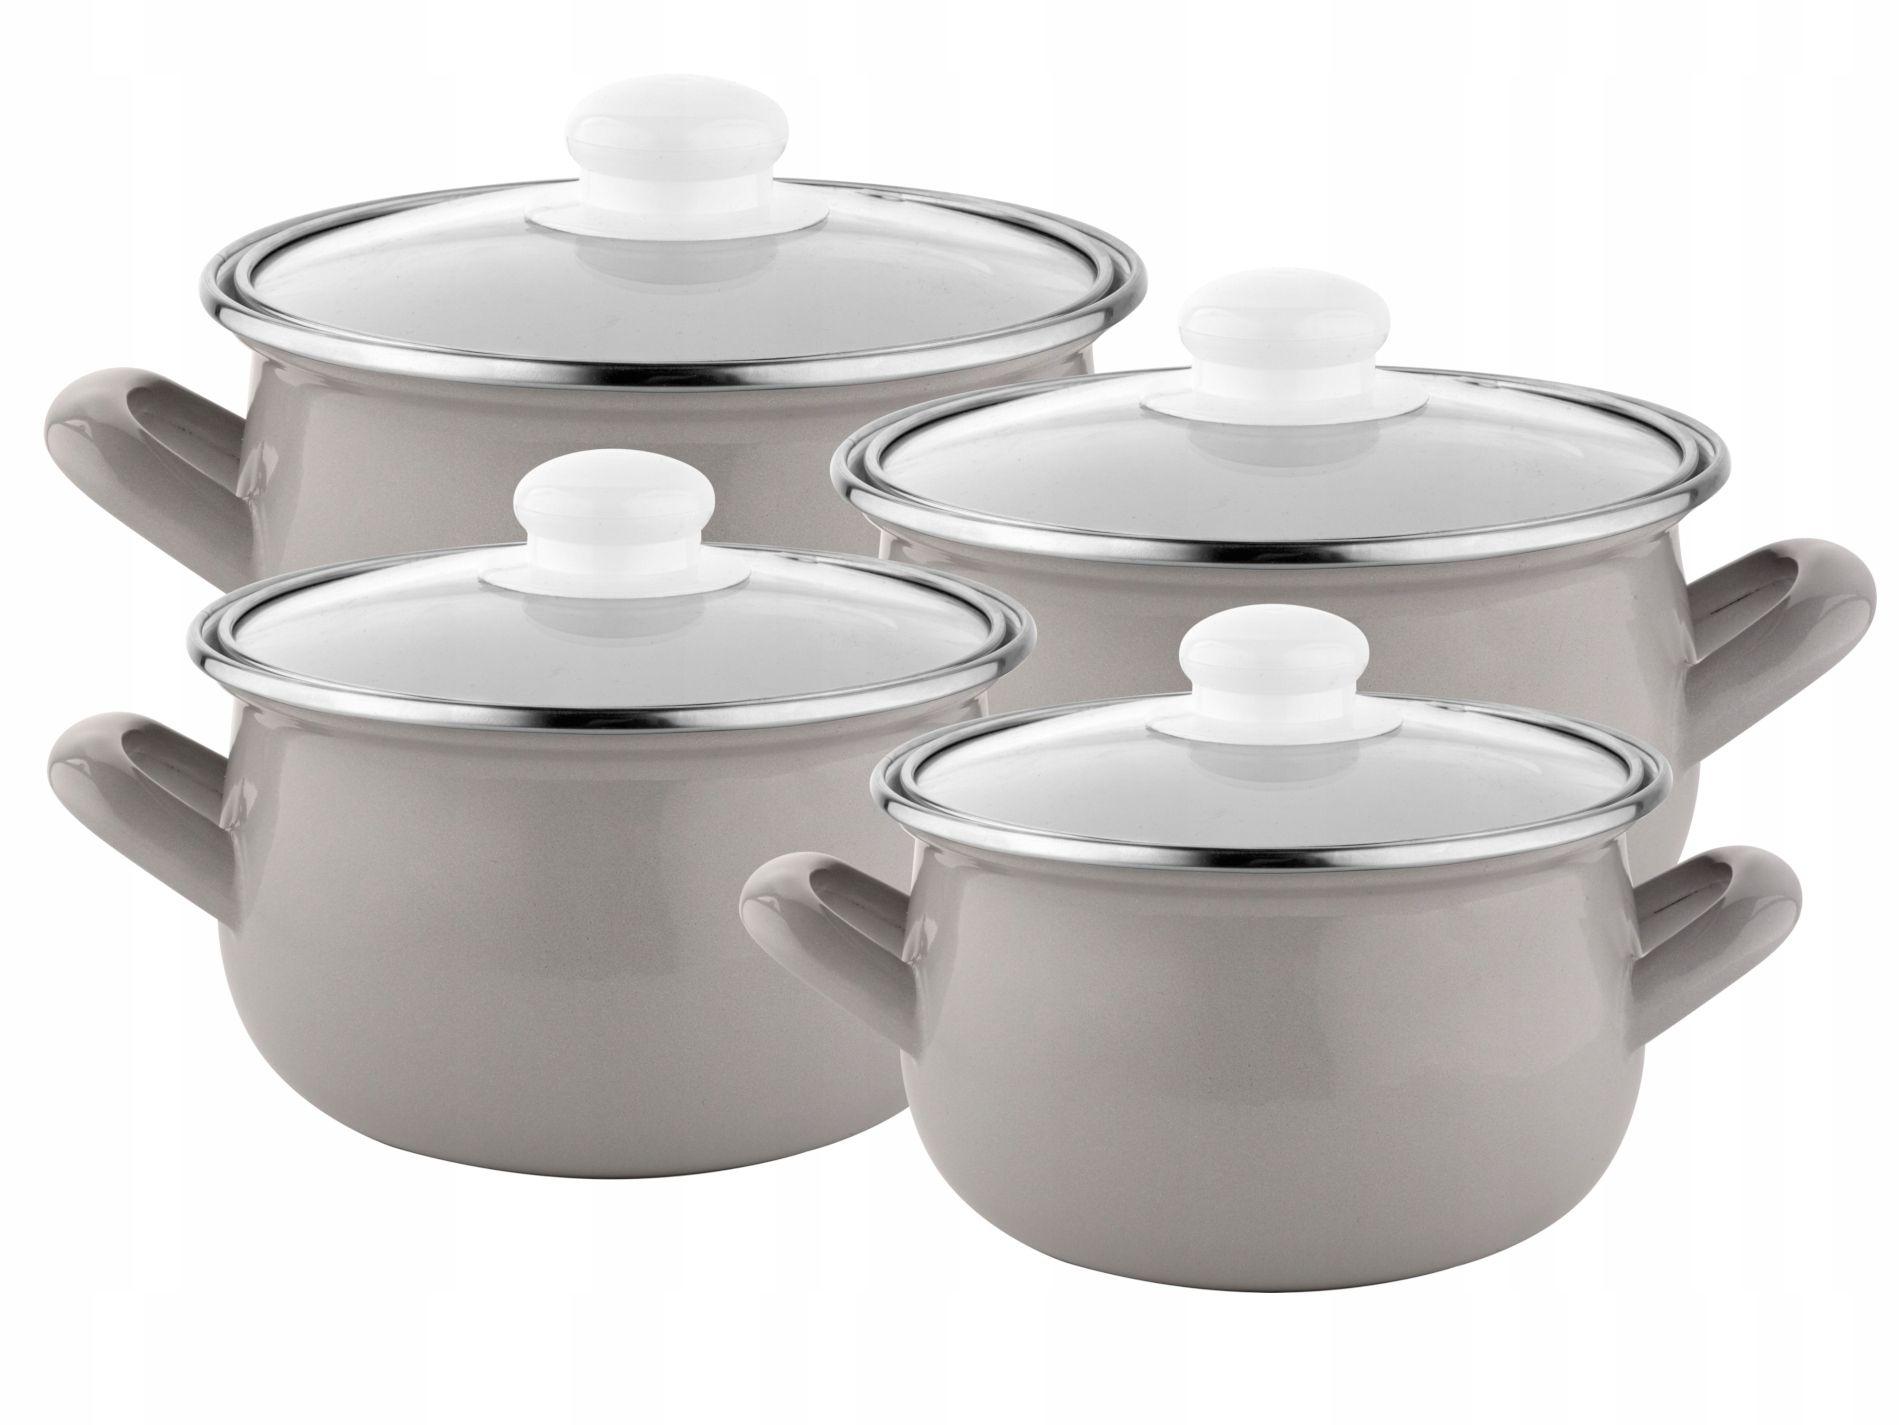 Komplet Garnkow Emaliowanych Capri 16 18 20 22cm Sugar Bowl Set Bowl Set Tea Pots